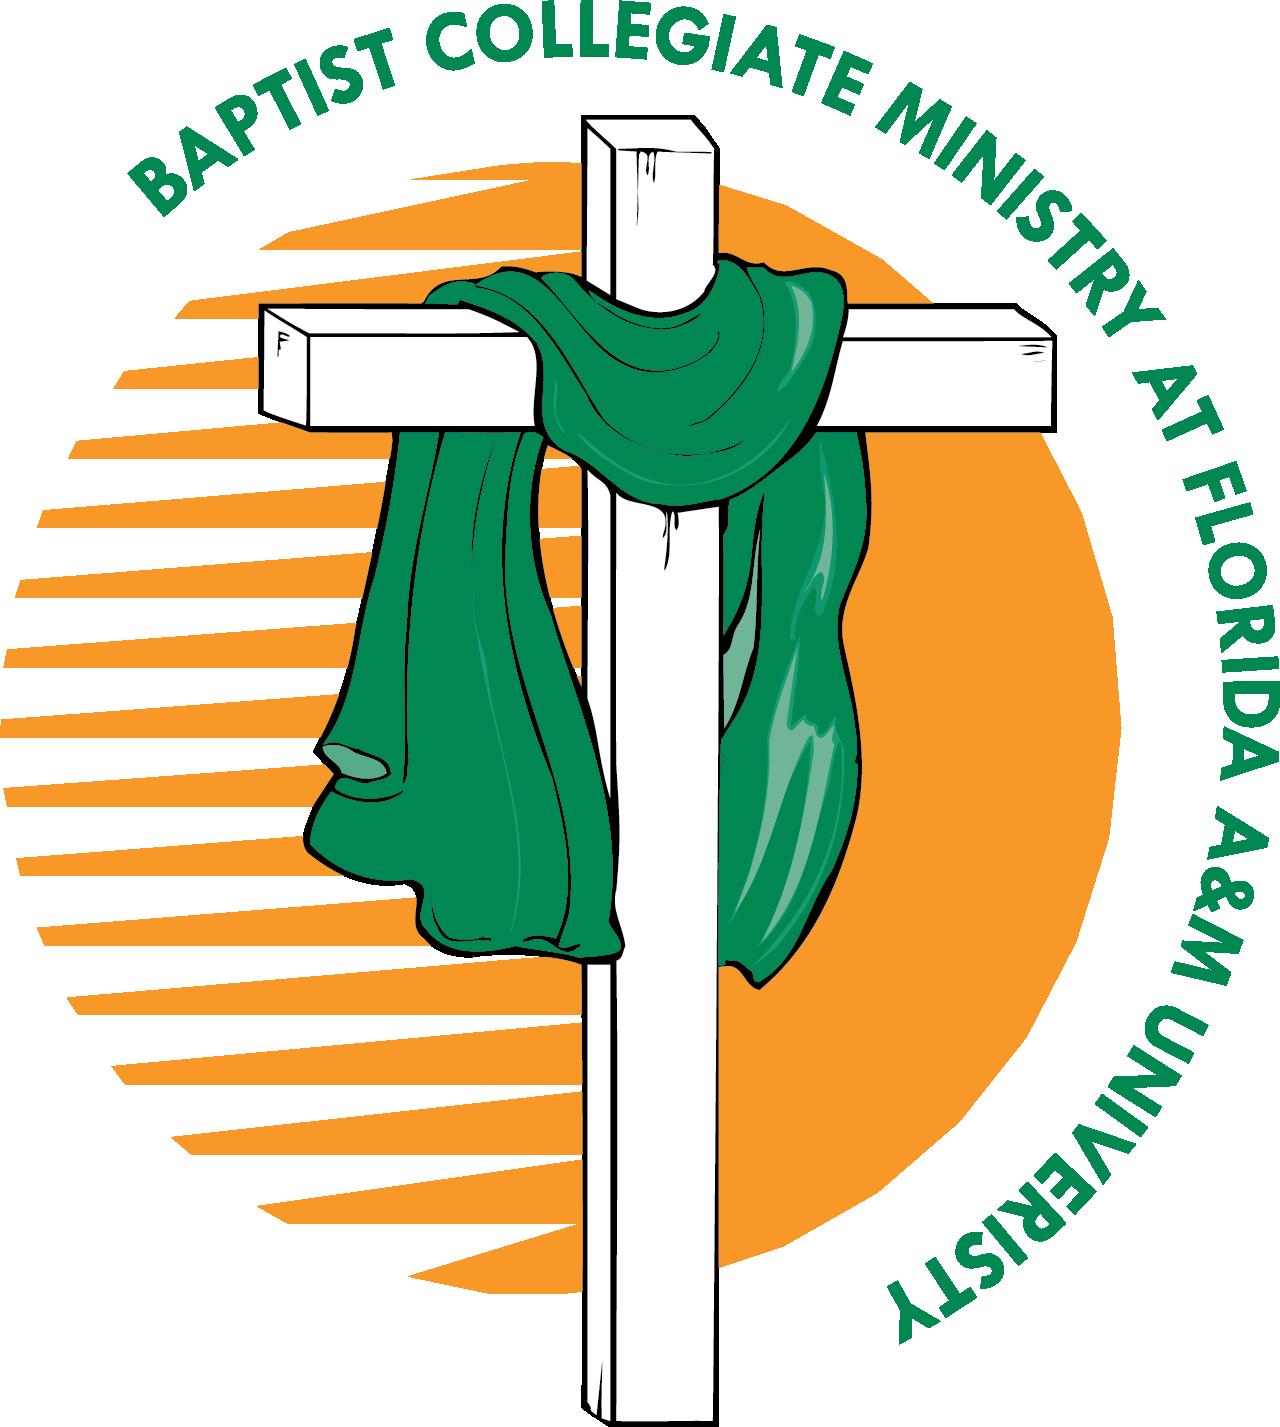 Famu baptist collegiate ministry. Mlk clipart community service